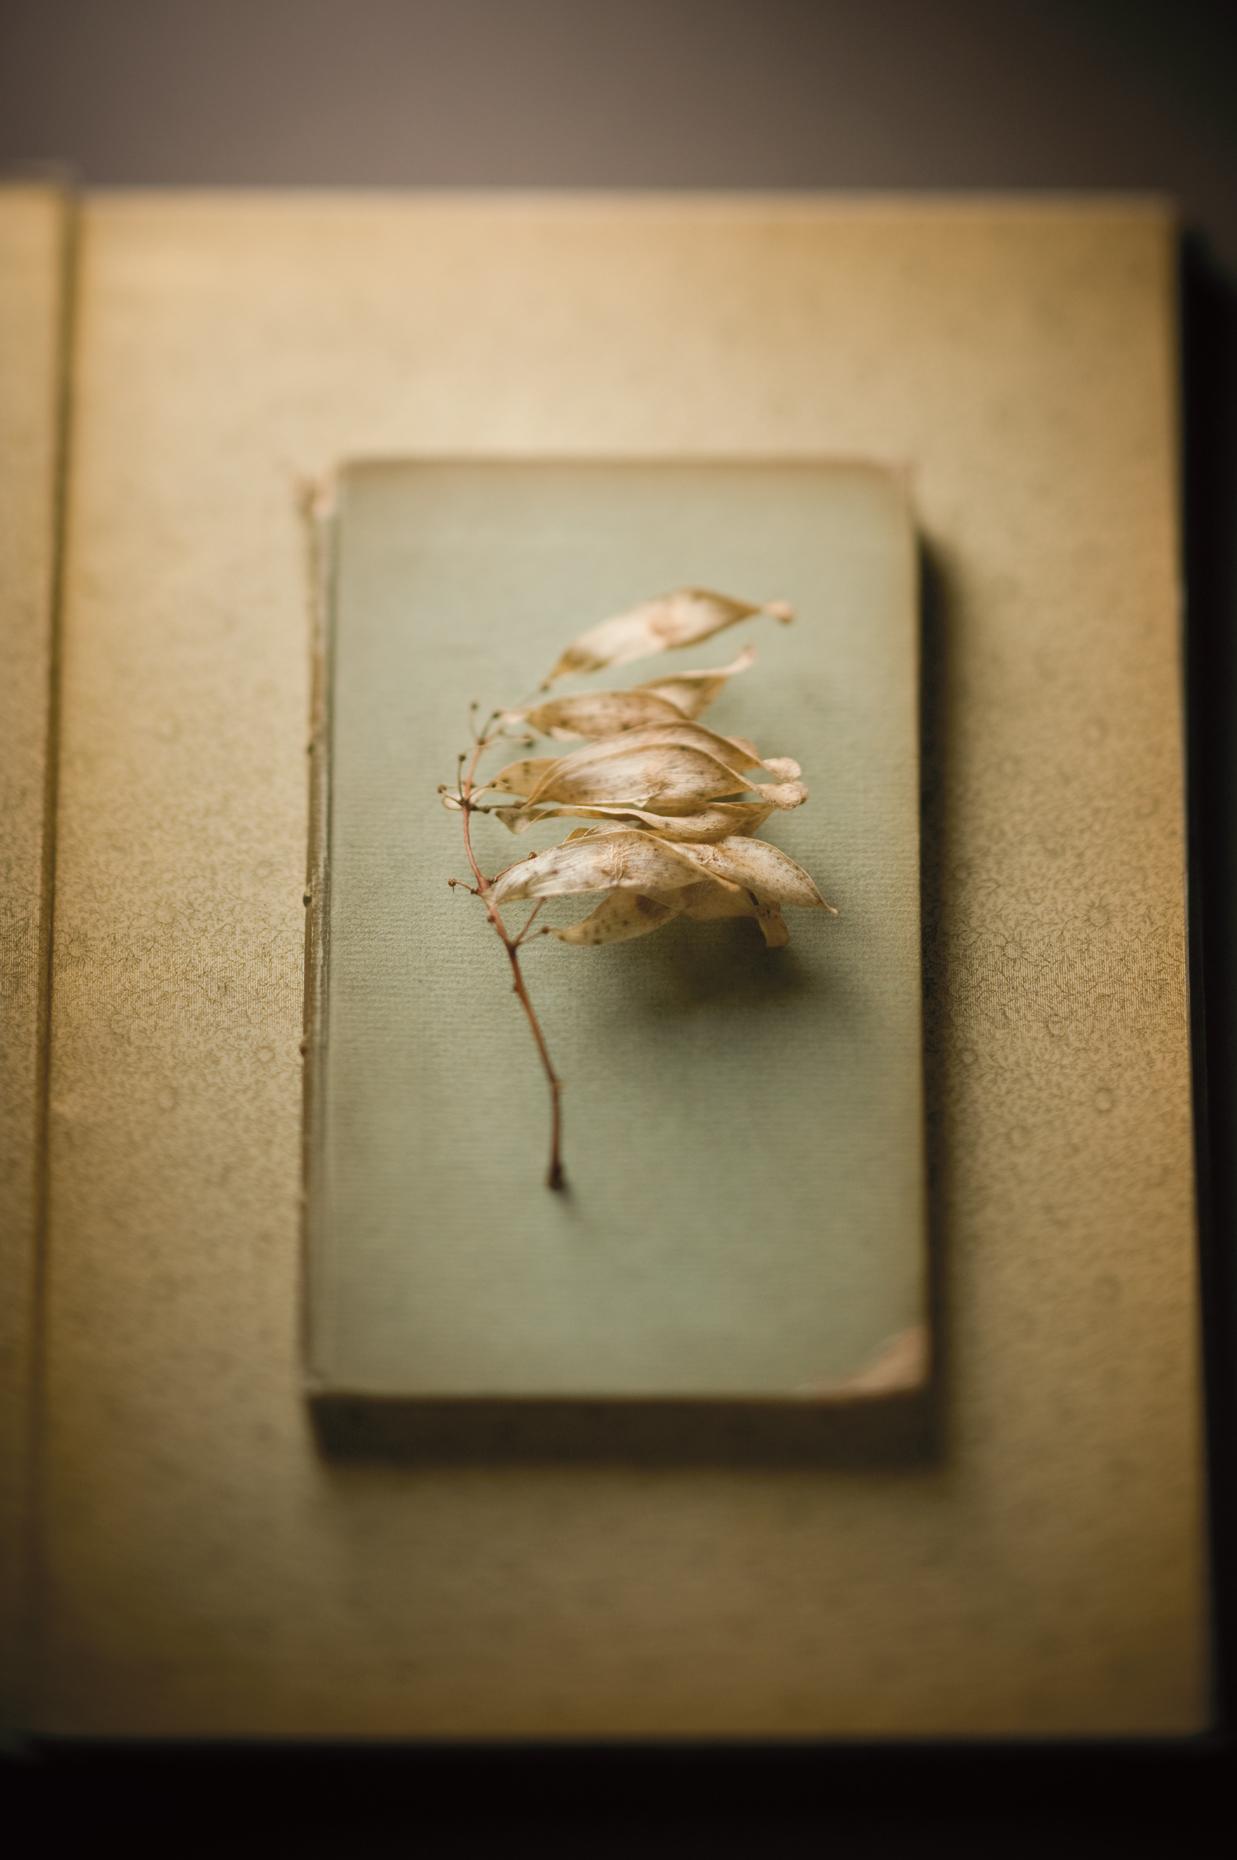 Product Photography Still Life Derek Israelsen 010 Leaves On Book